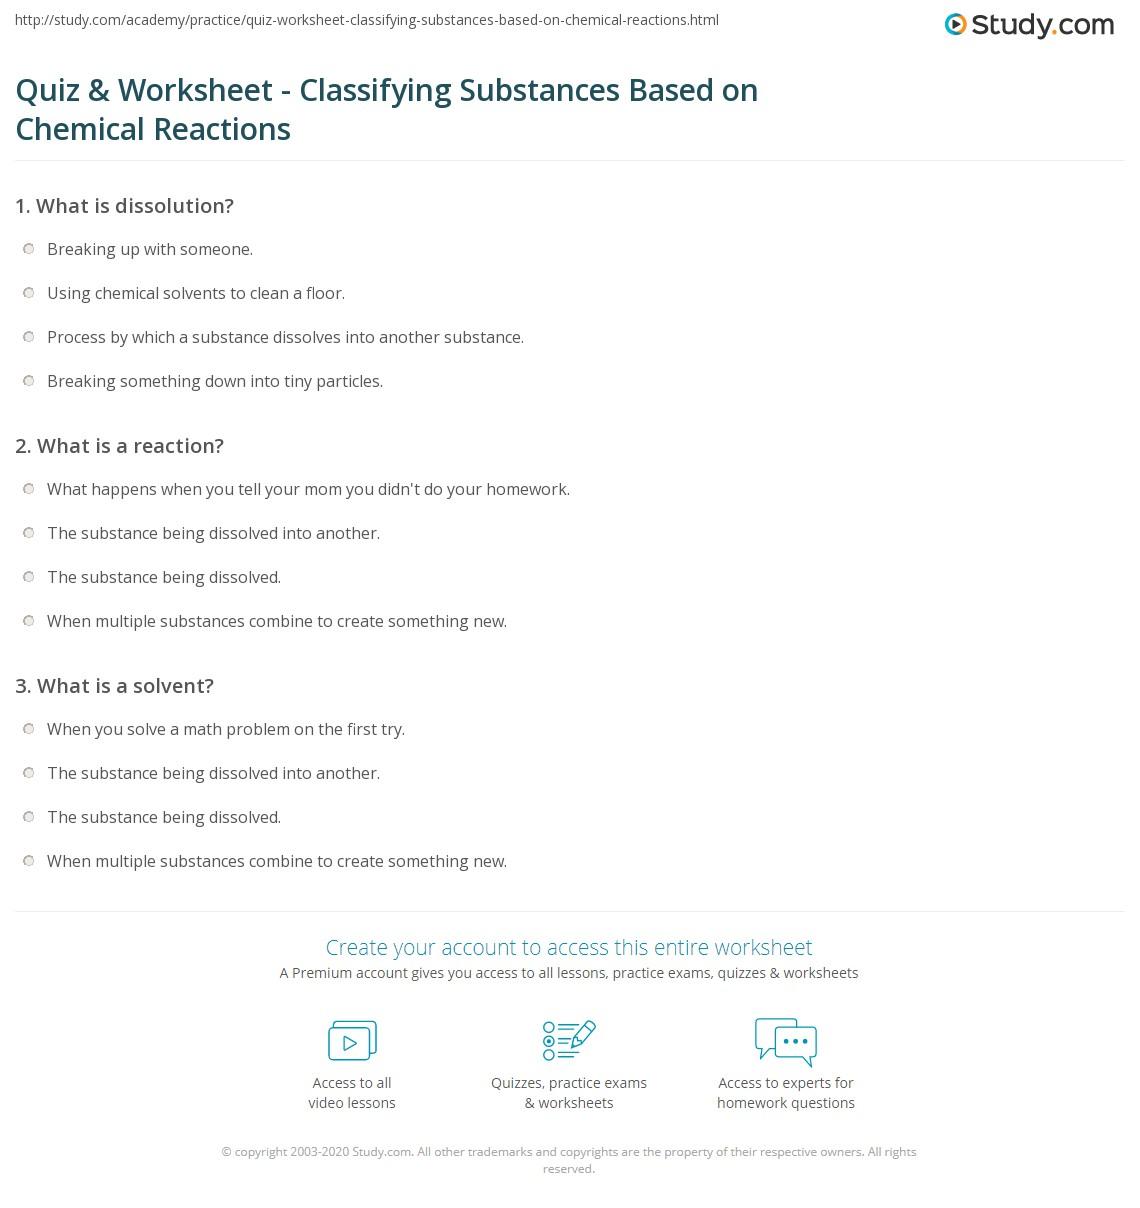 Workbooks tion worksheets printable : Classification Of Chemical Reactions Worksheet Free Worksheets ...